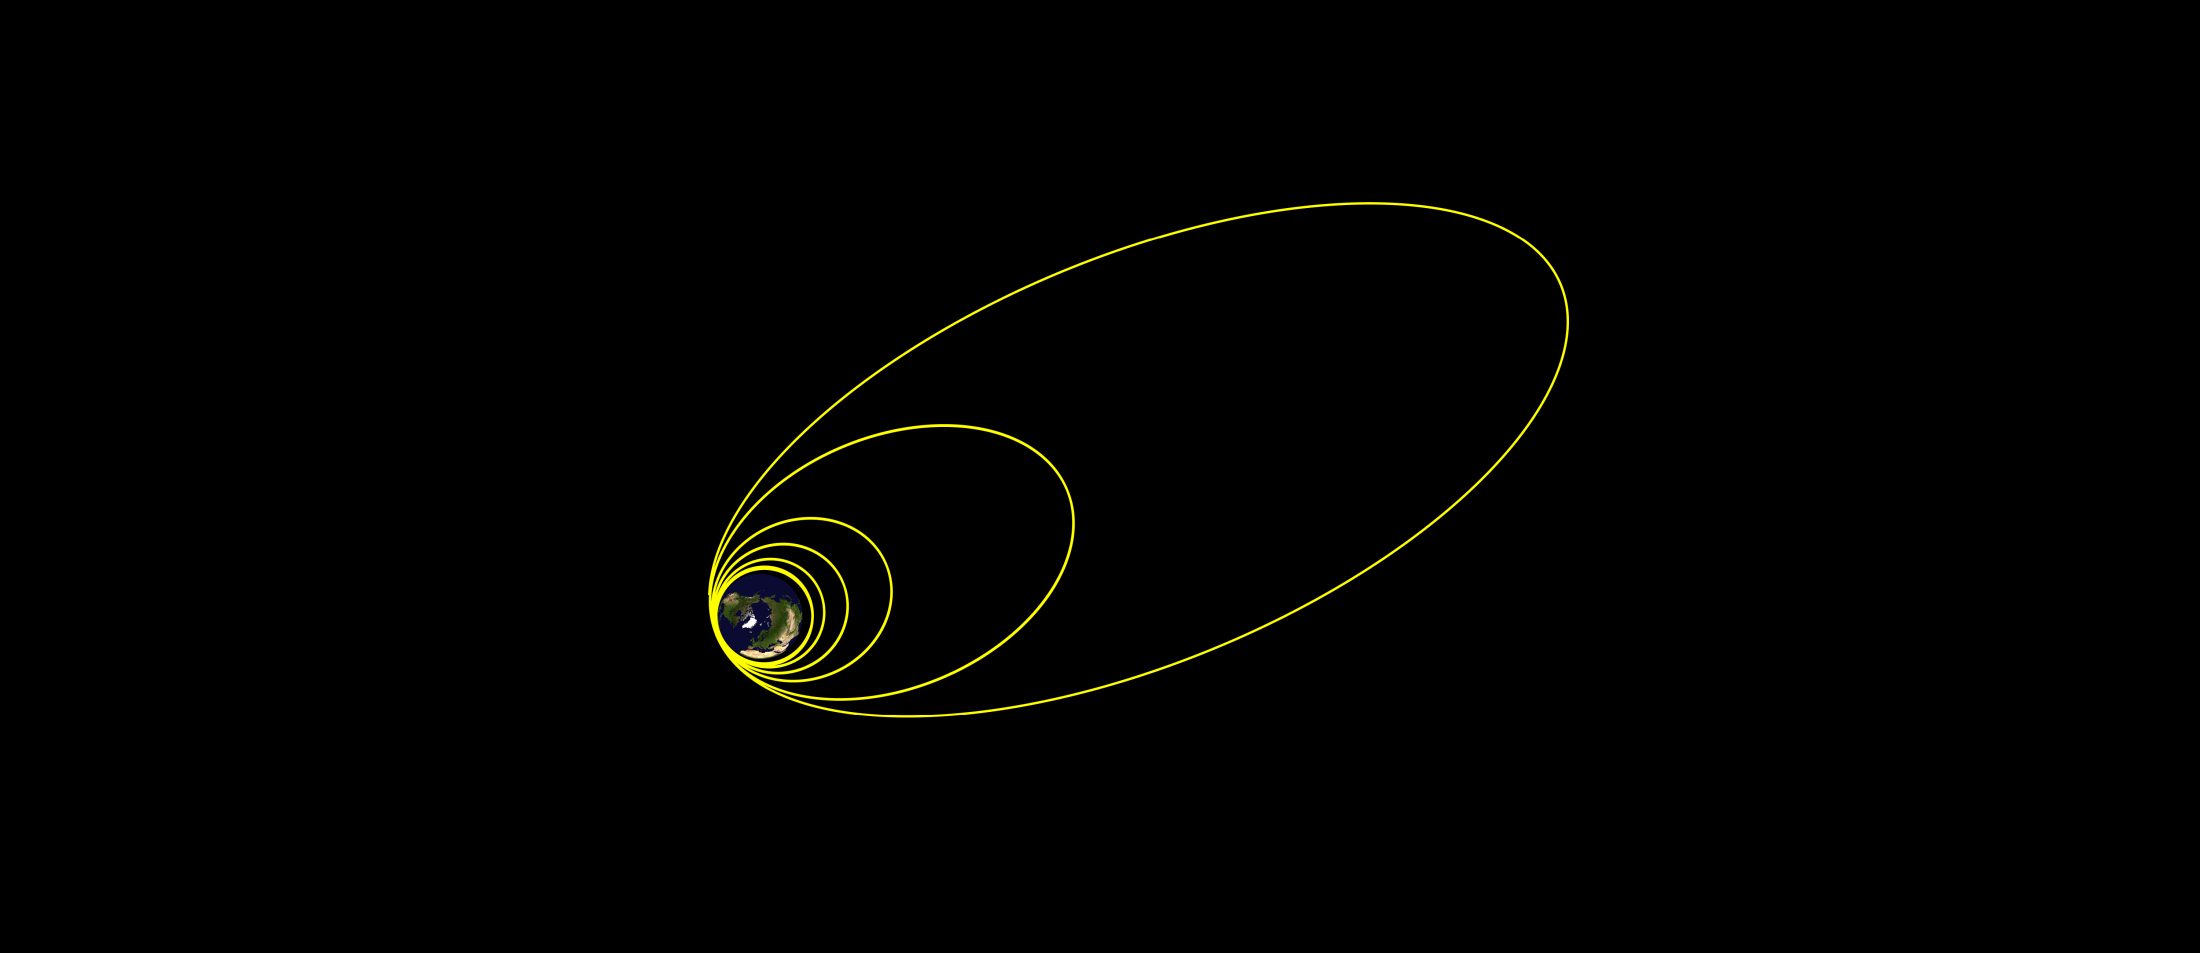 LISA Pathfinder apogee-raising orbits, prior to departure for SEL1 Credit: ESA